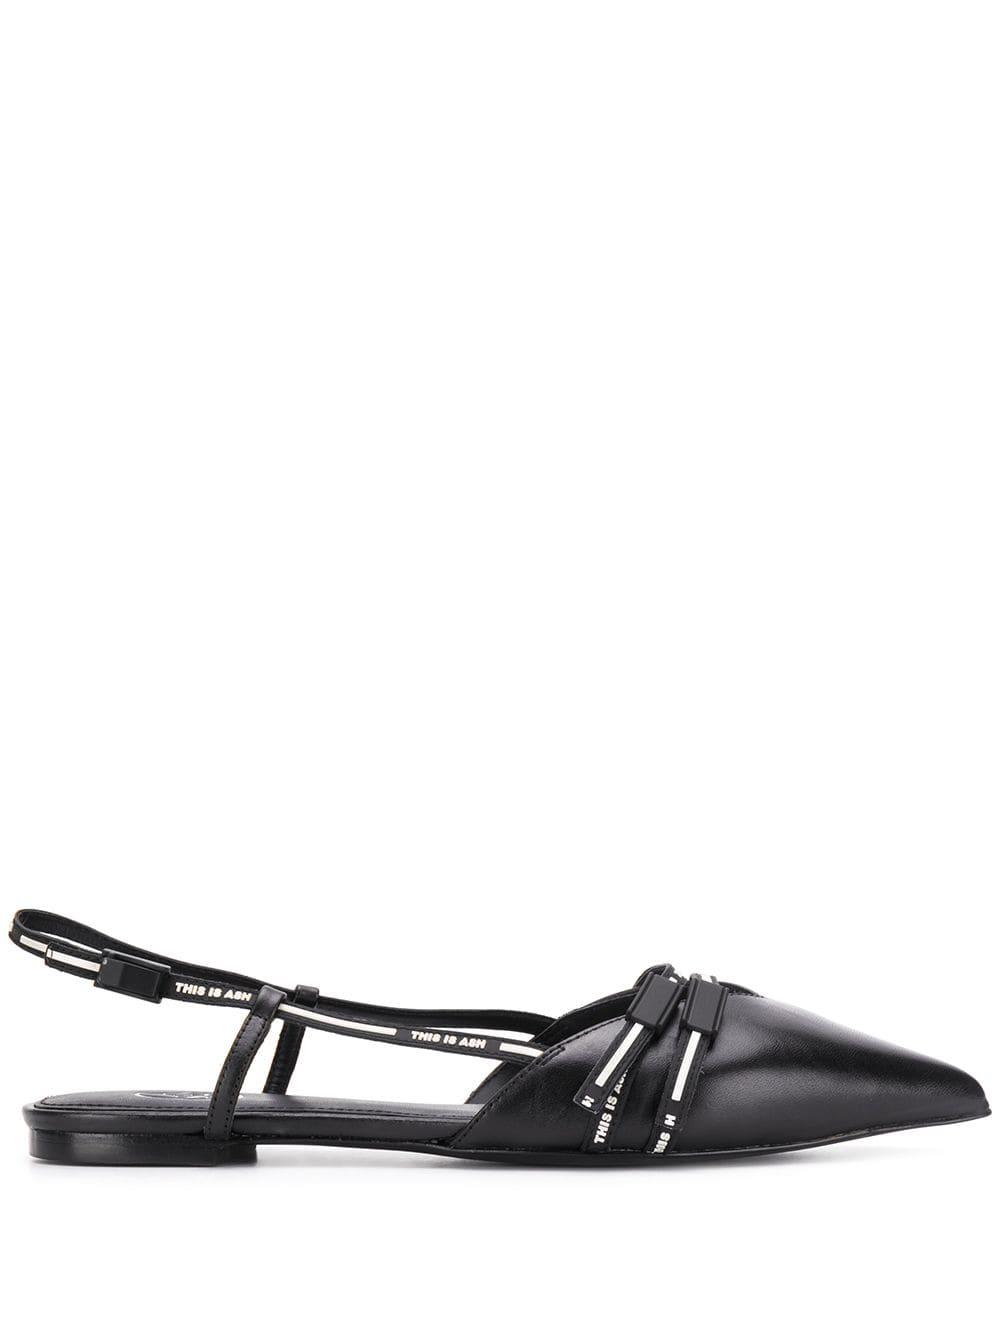 b4c5d0e4cc80 Black Delight Sandals - ASH - Russocapri